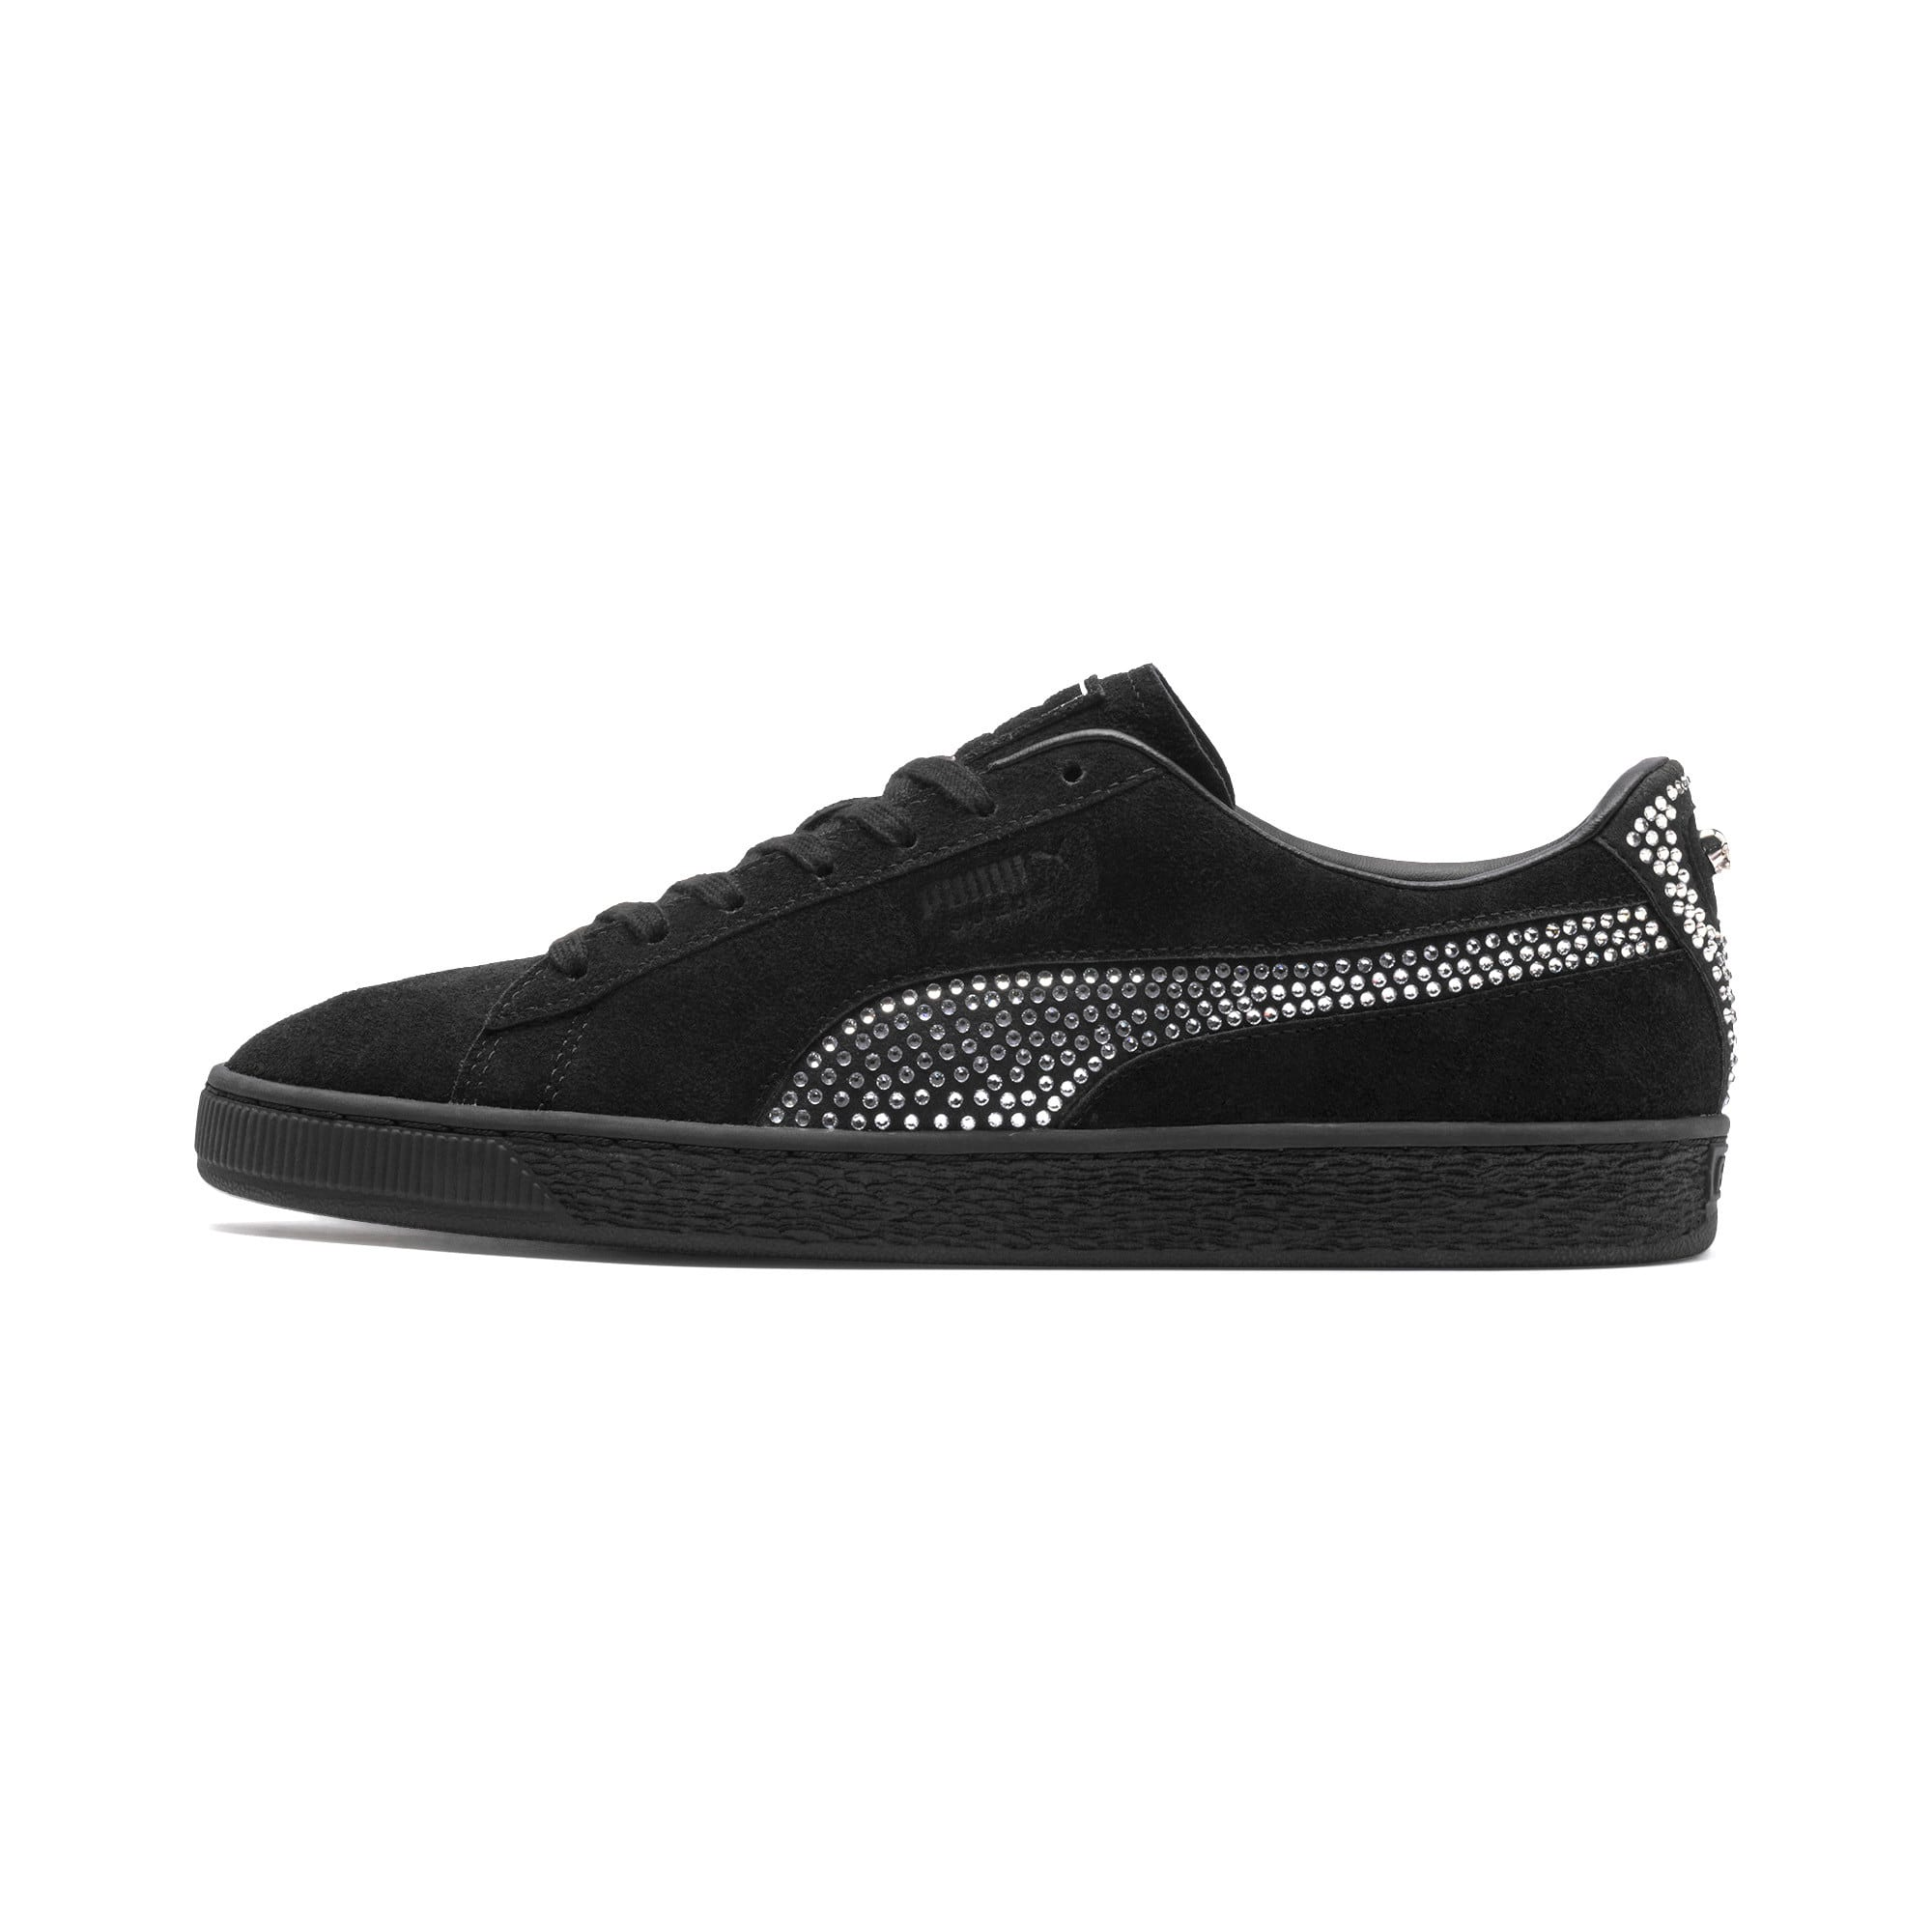 Miniatura 1 de Zapatos deportivos de gamuza PUMA x THE KOOPLES, Puma Black, mediano